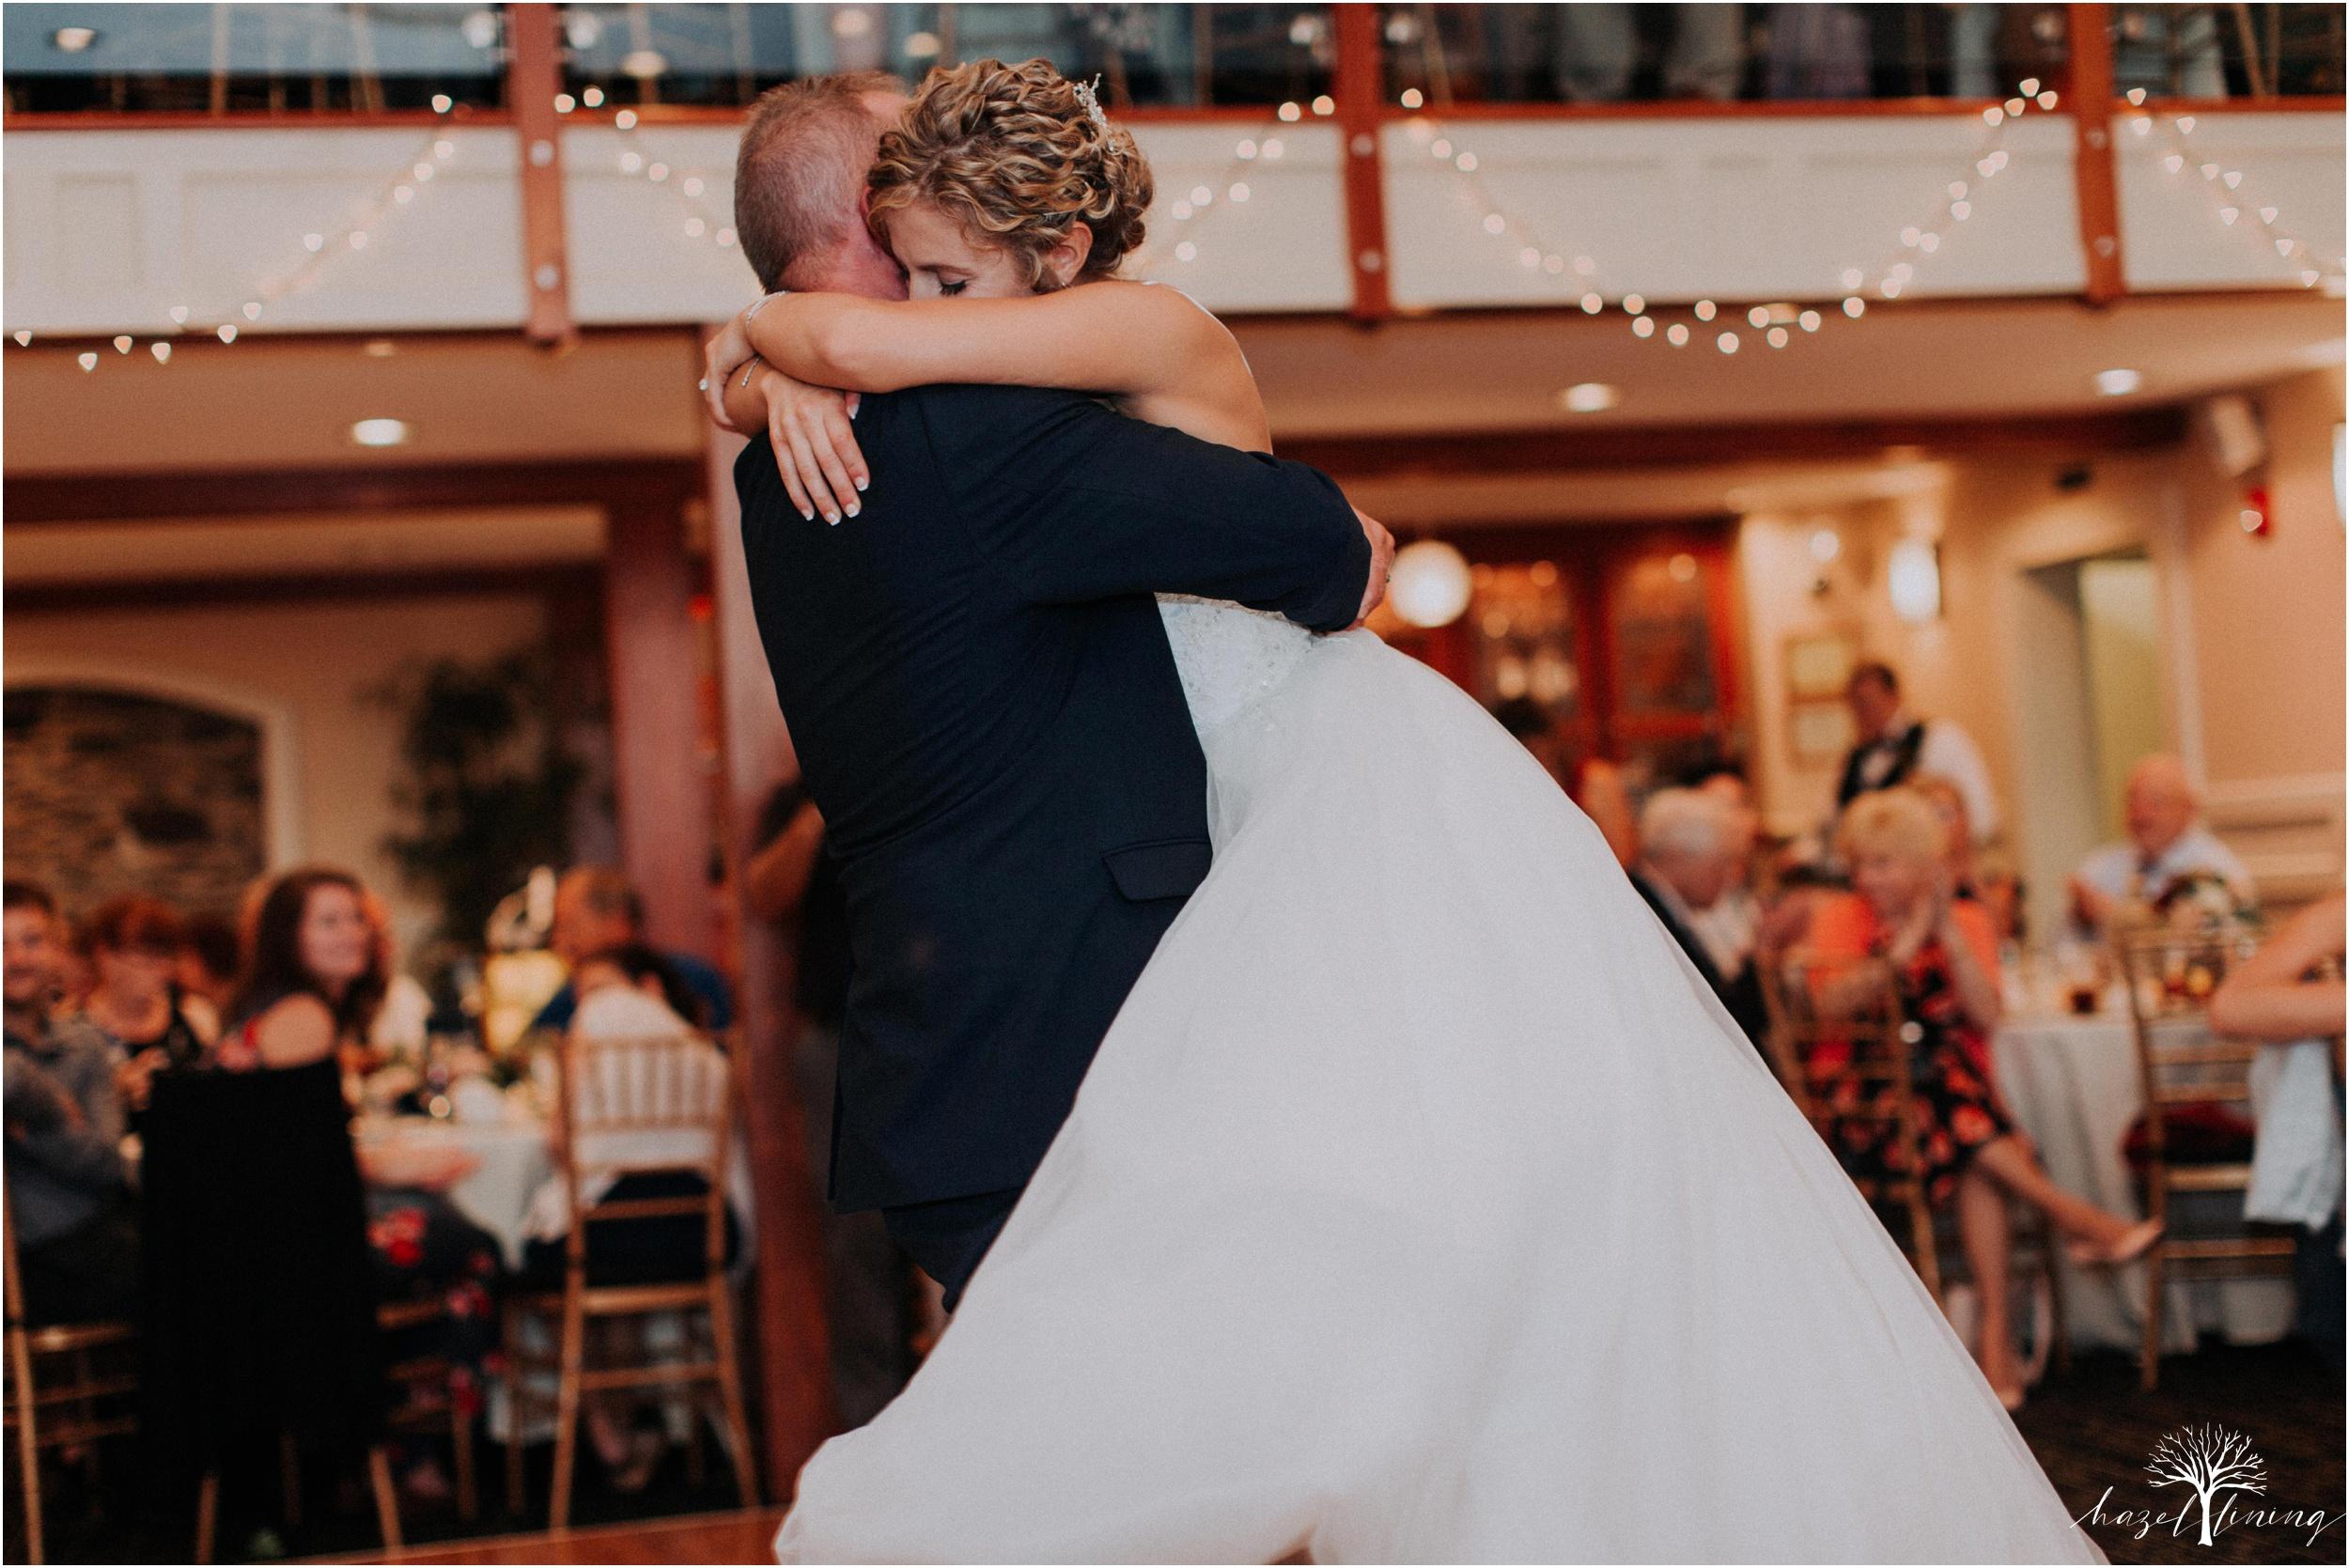 jonathan-weibel-becky-haywood-loft-at-sweetwater-cc-pennsburg-pennsylvania-rainy-day-summer-wedding-hazel-lining-travel-wedding-elopement-photography_0121.jpg